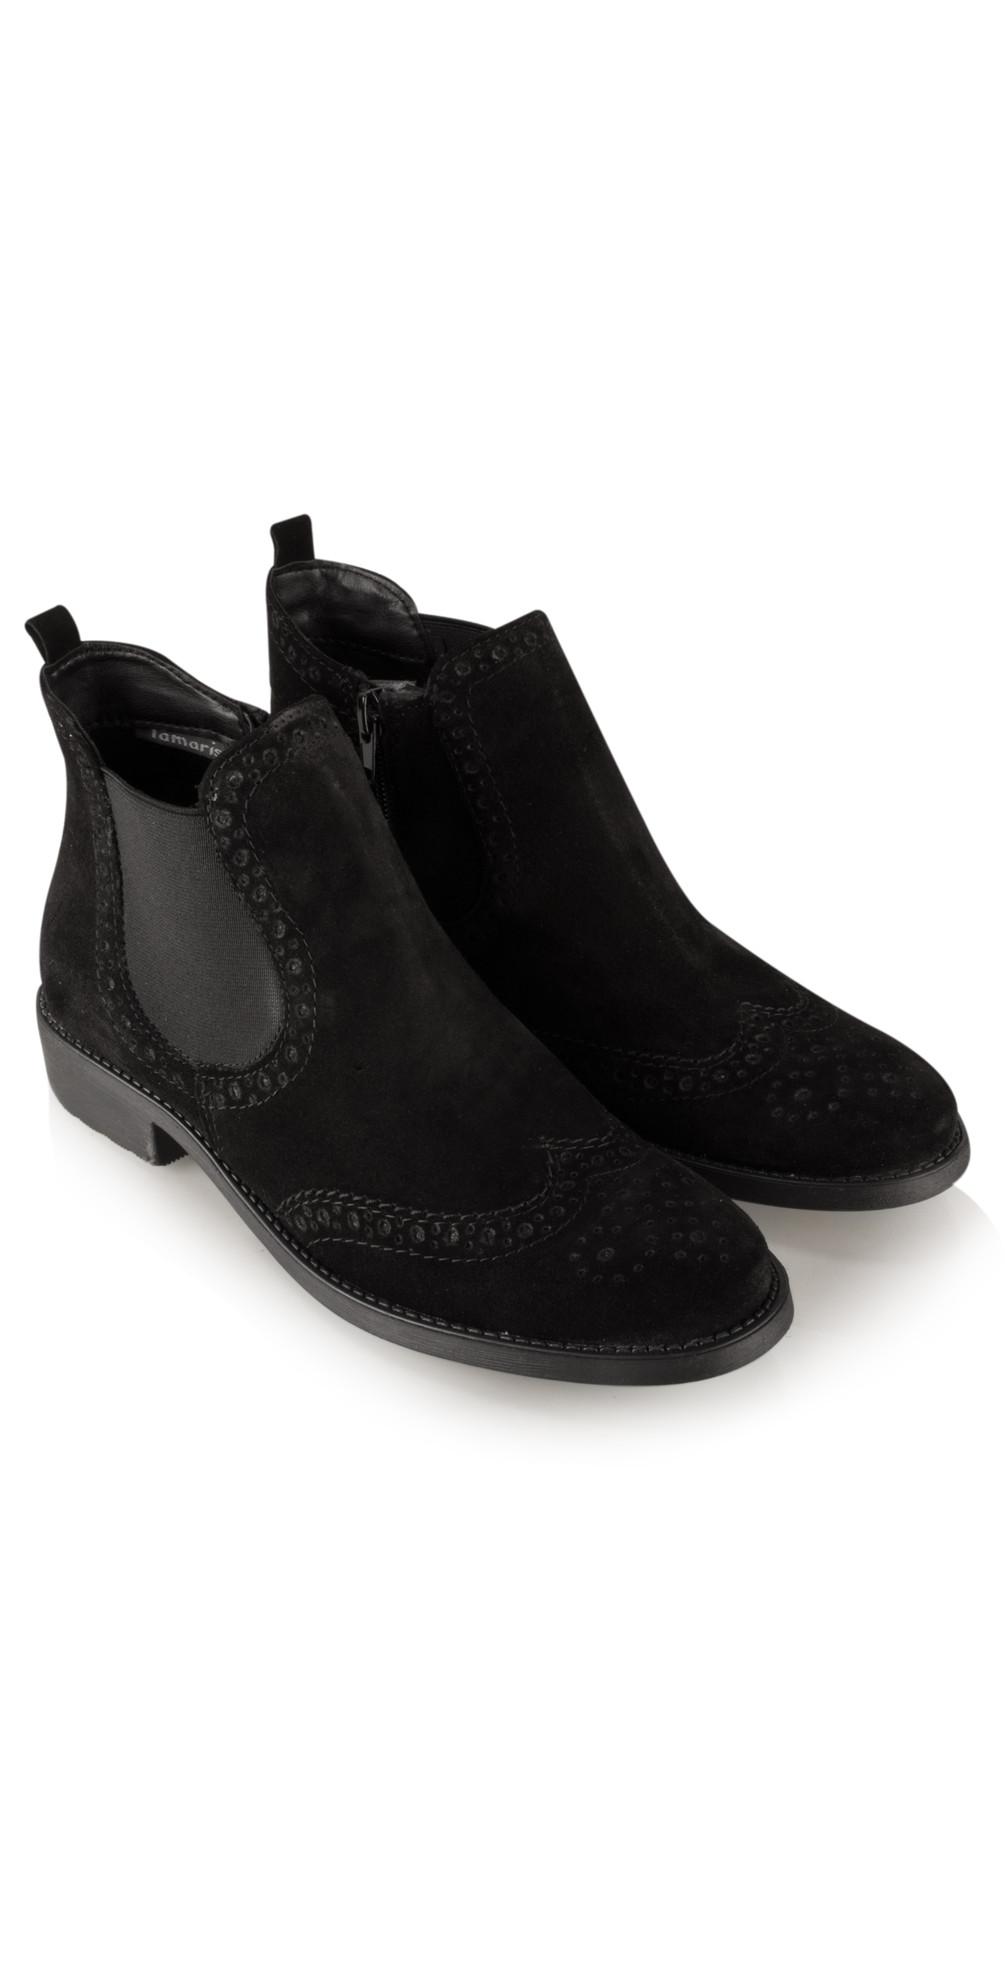 tamaris brogue chelsea boot in black. Black Bedroom Furniture Sets. Home Design Ideas